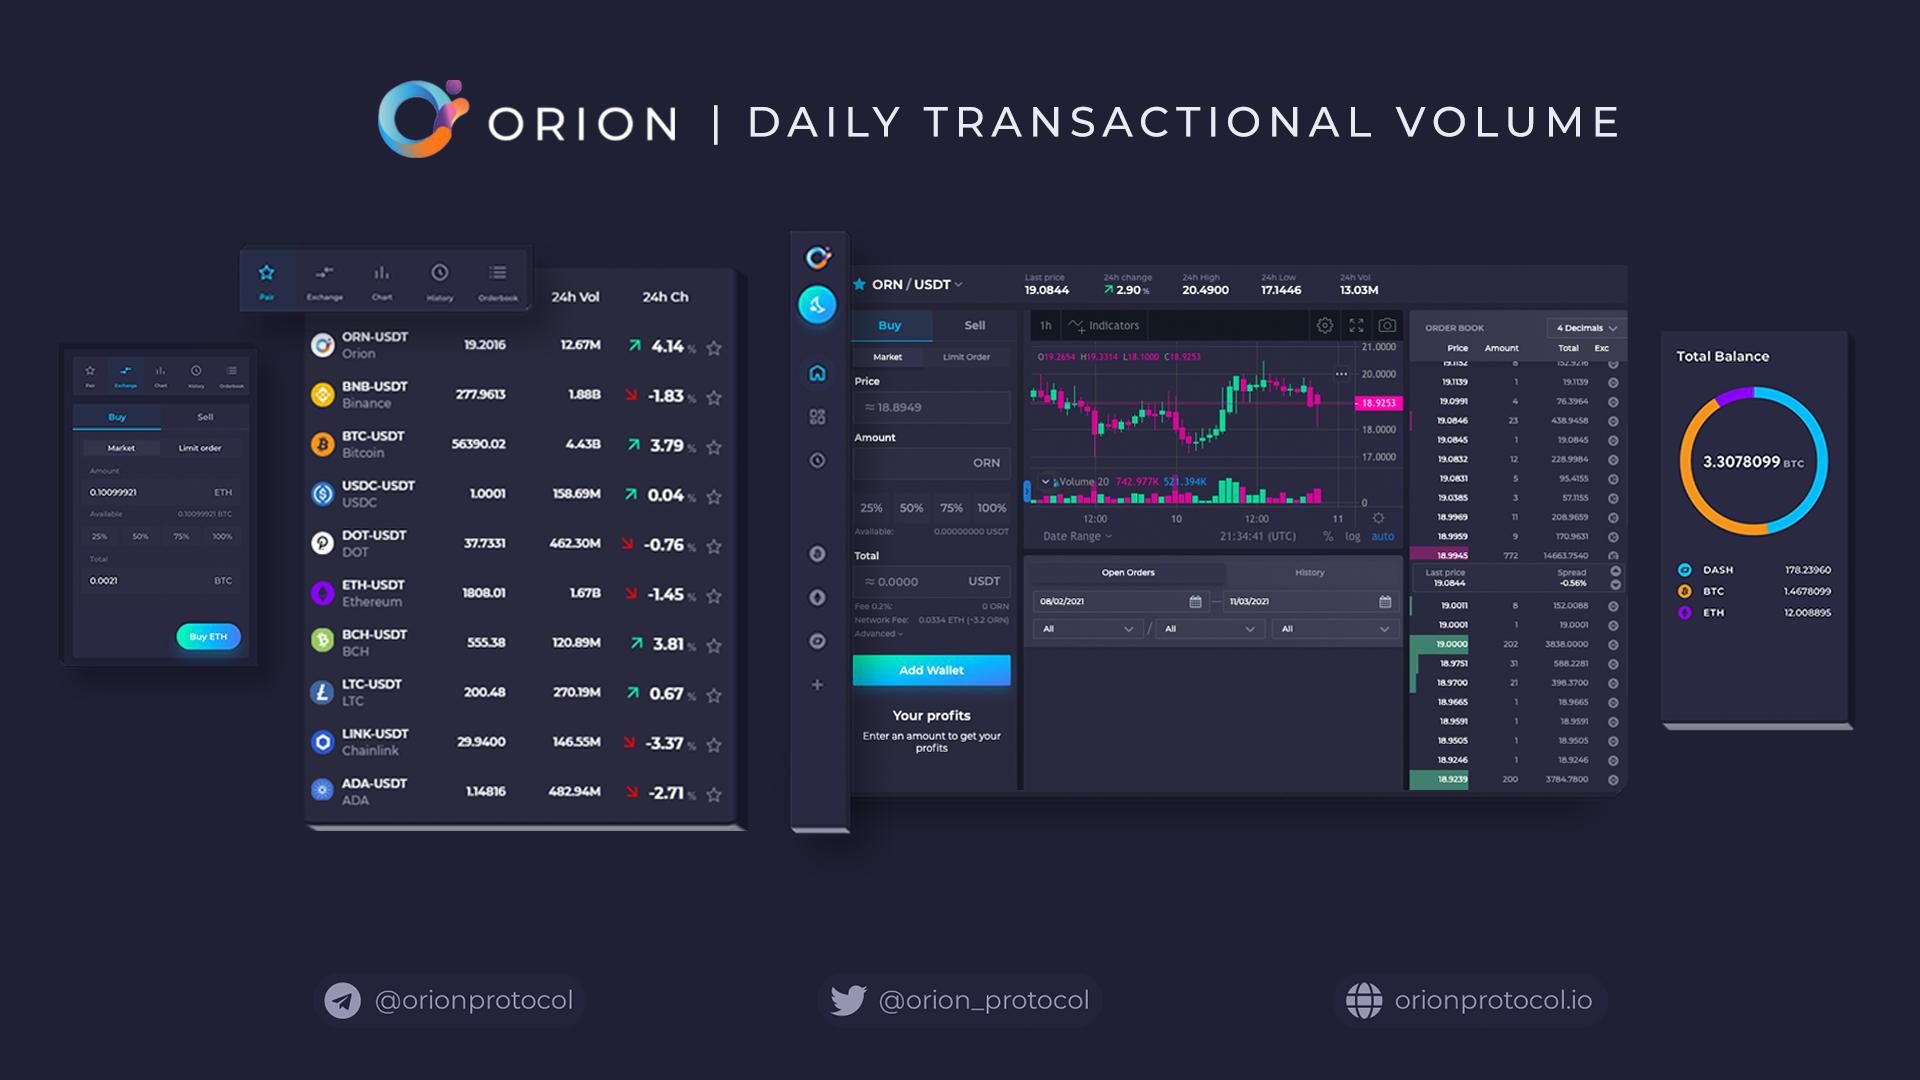 Orion Volume Dashboard